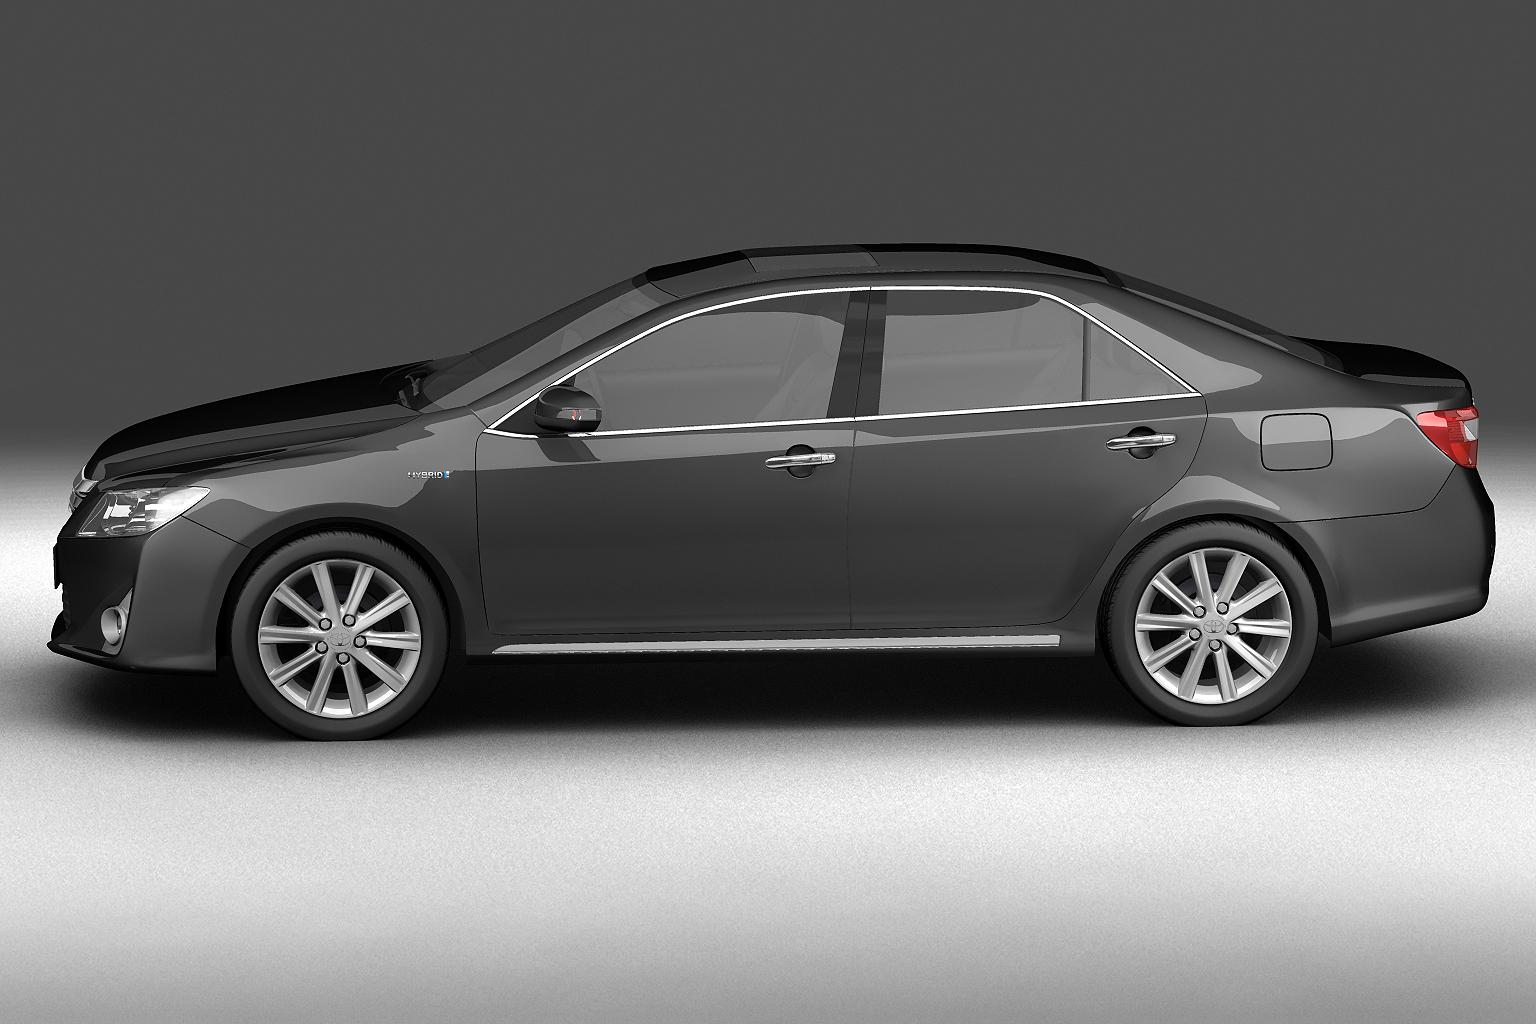 2012 toyota camry model 3d hybrid (asian) 3ds max fbx c4d lwo hrc xsi obj 136183